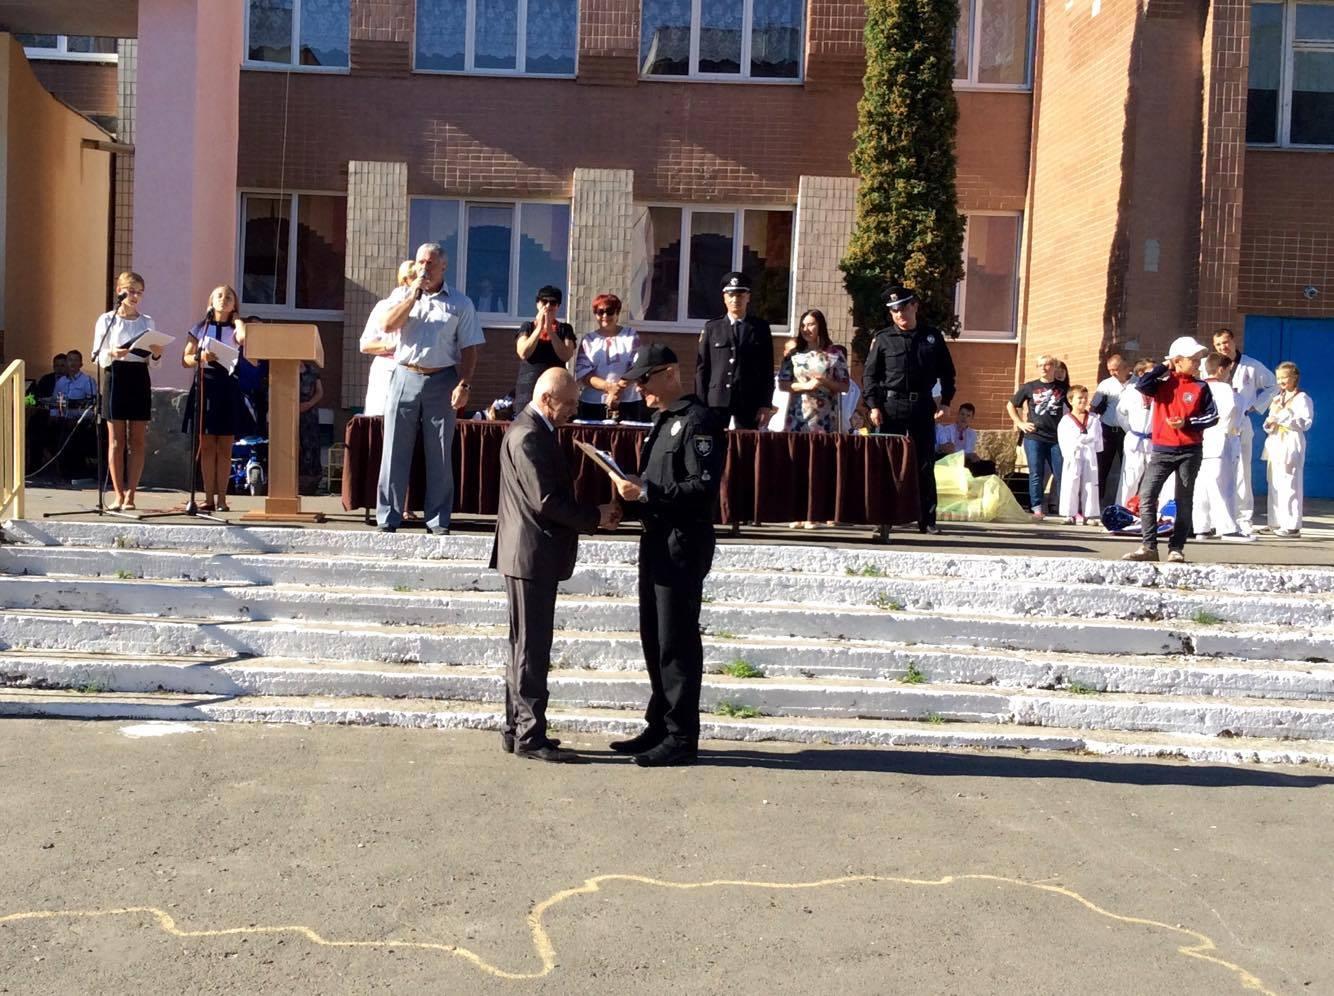 Хмельницький НВК№10 на Першовересень заполонили поліцейські - фото 7